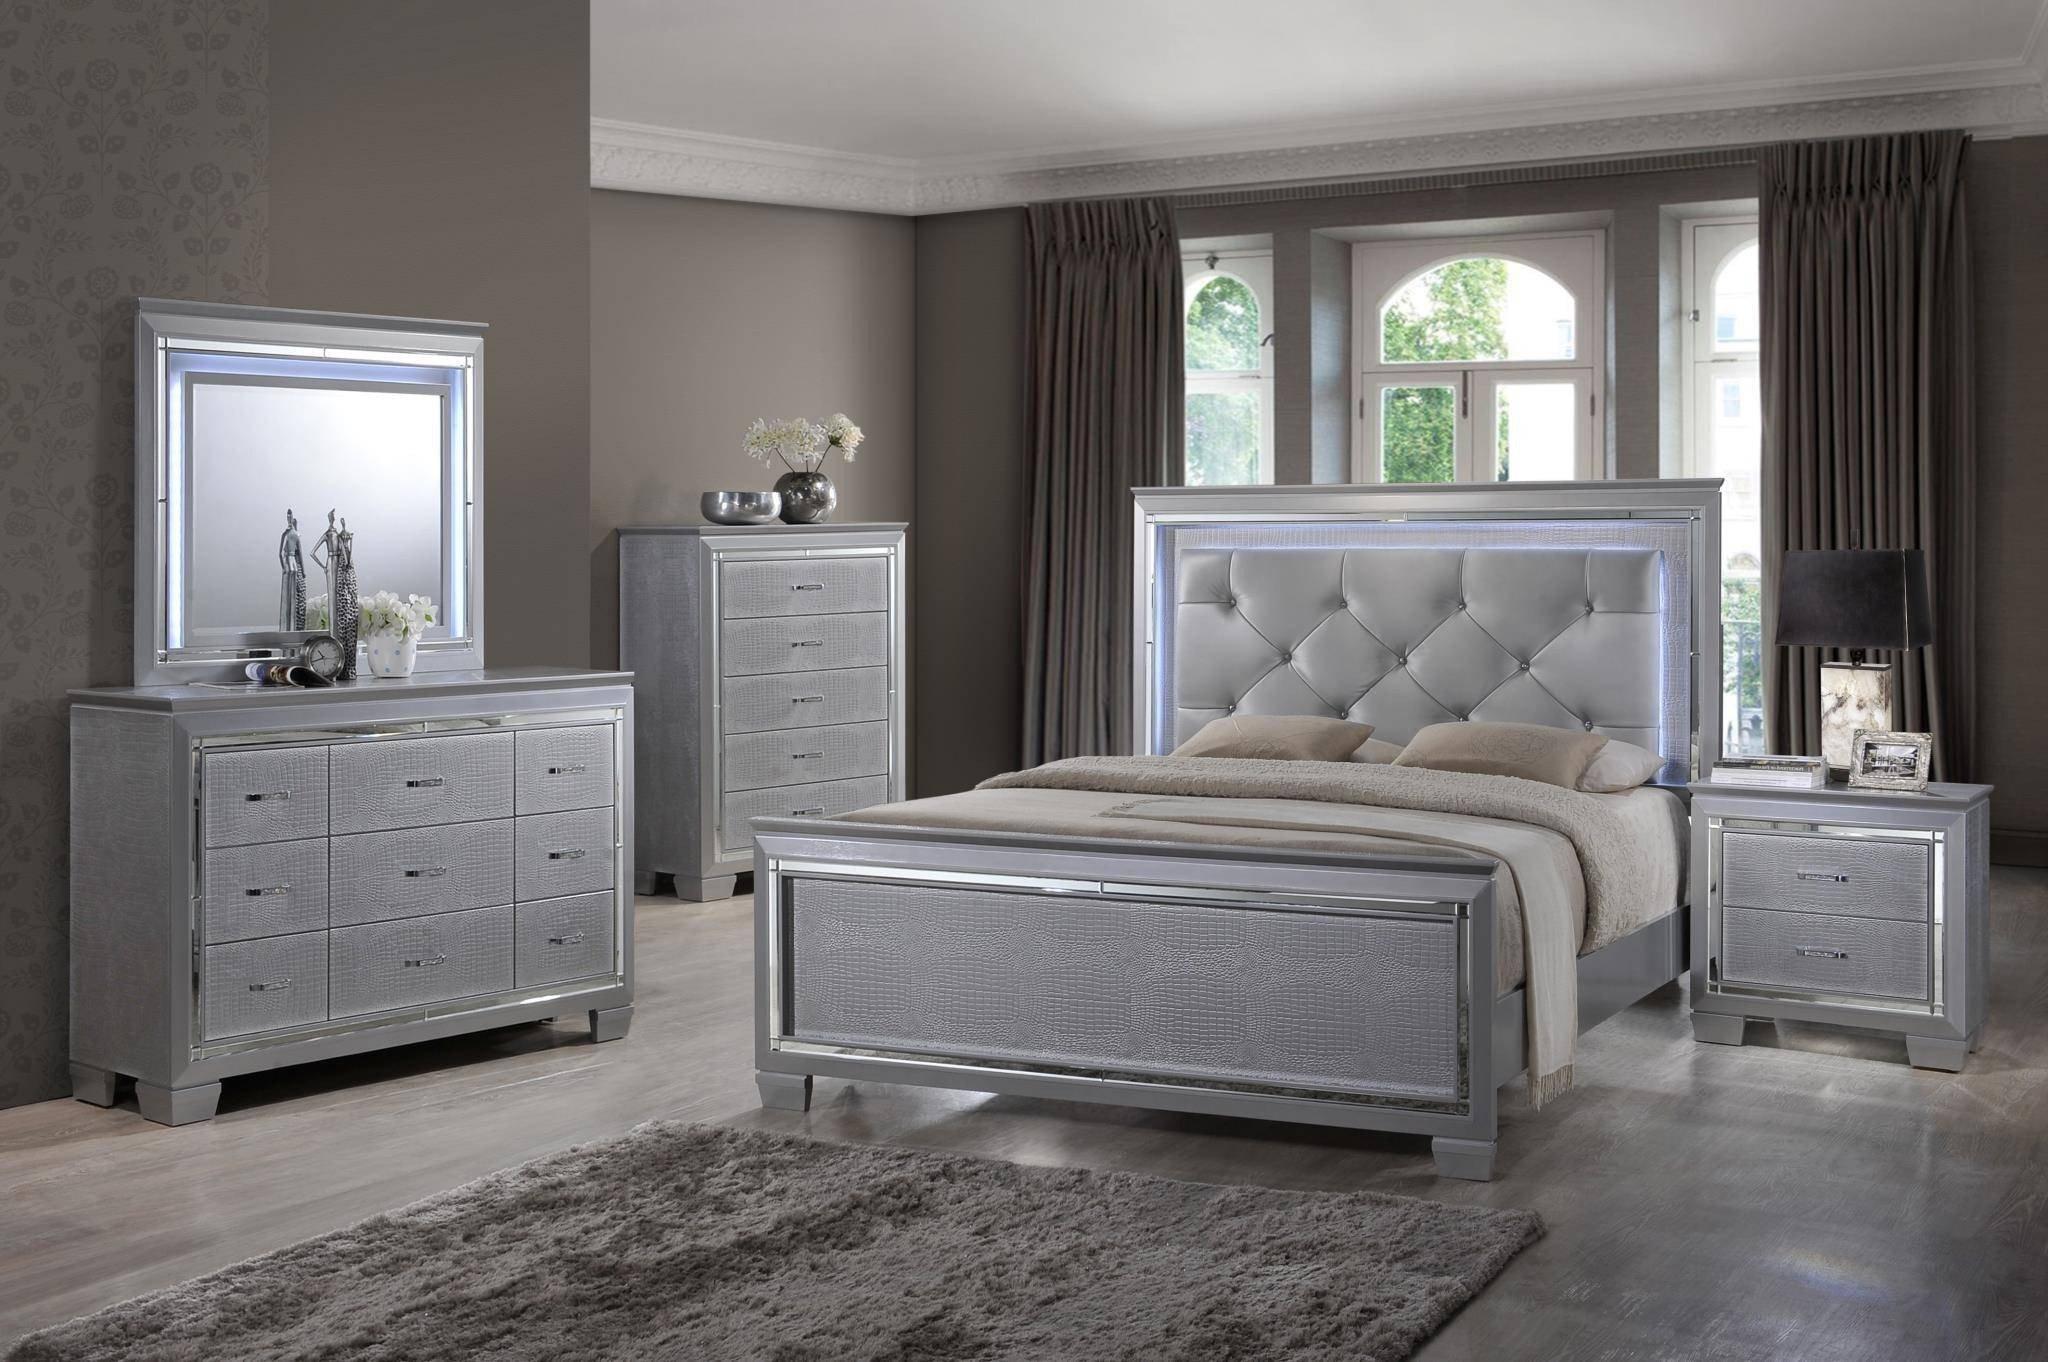 Silver Grey Bedroom Furniture Elegant Myco Furniture Ma700 K Martina Silver Diamond Tufted King